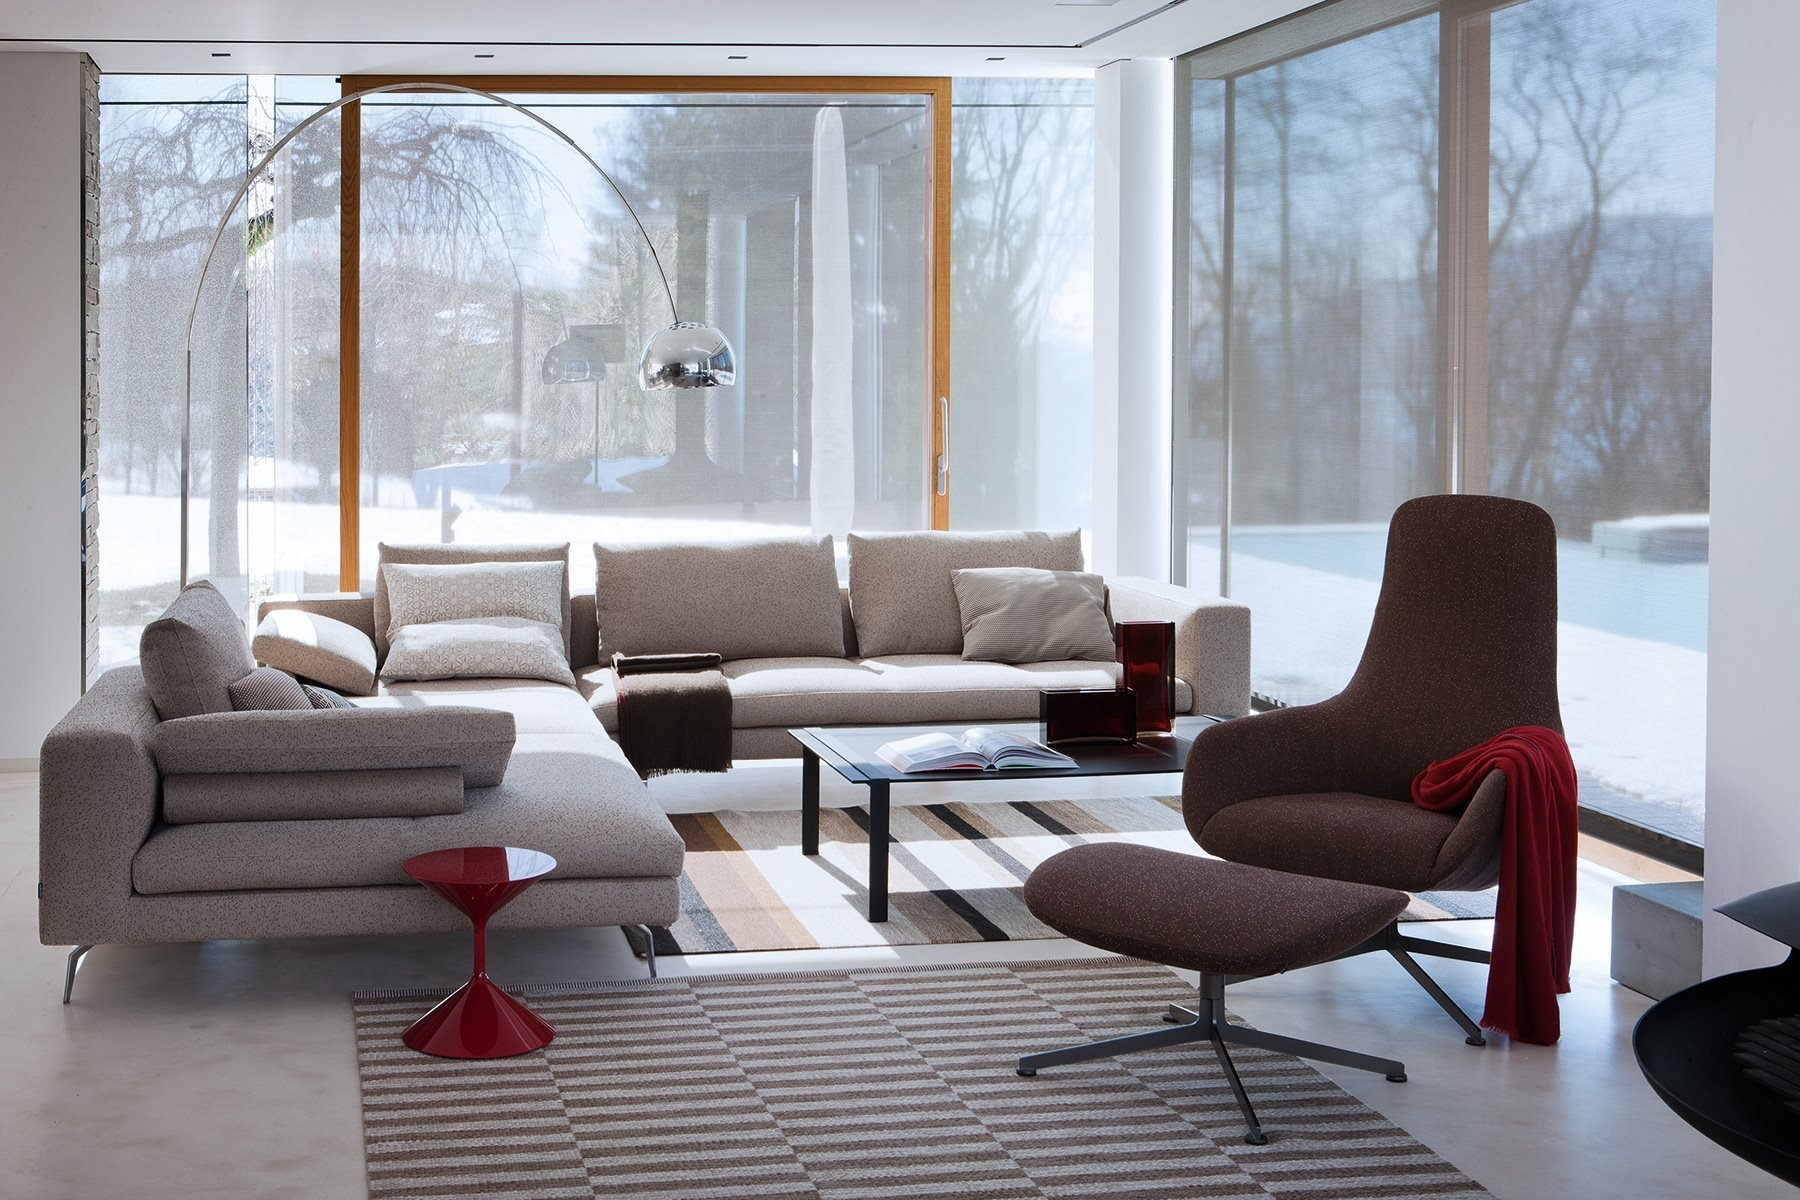 Bruce Sofa modular from Zanotta, designed by Ludovica